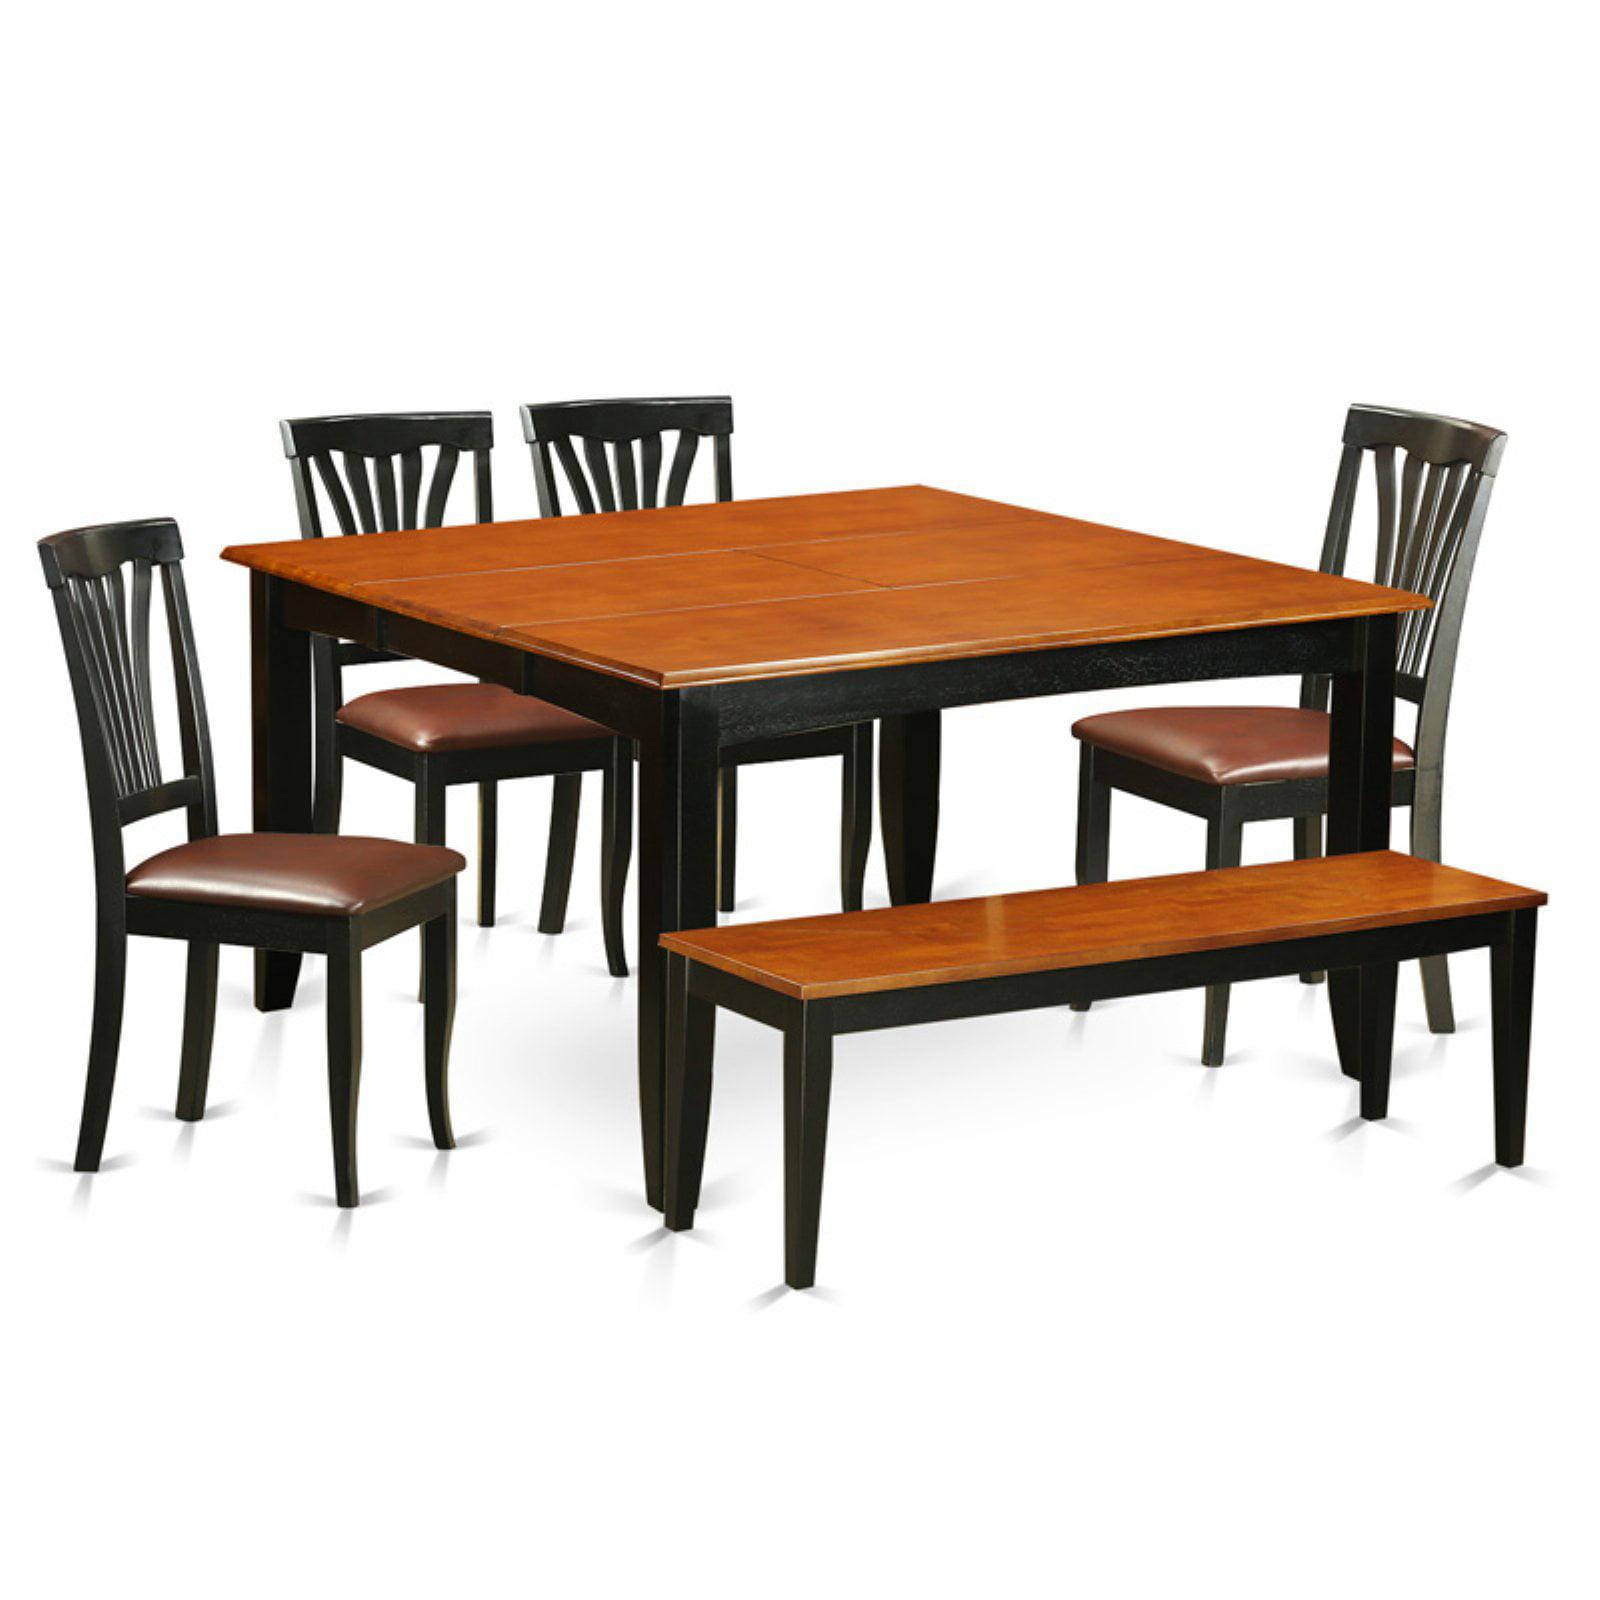 East West Furniture Parfait 6 Piece Lath Back Dining Table Set